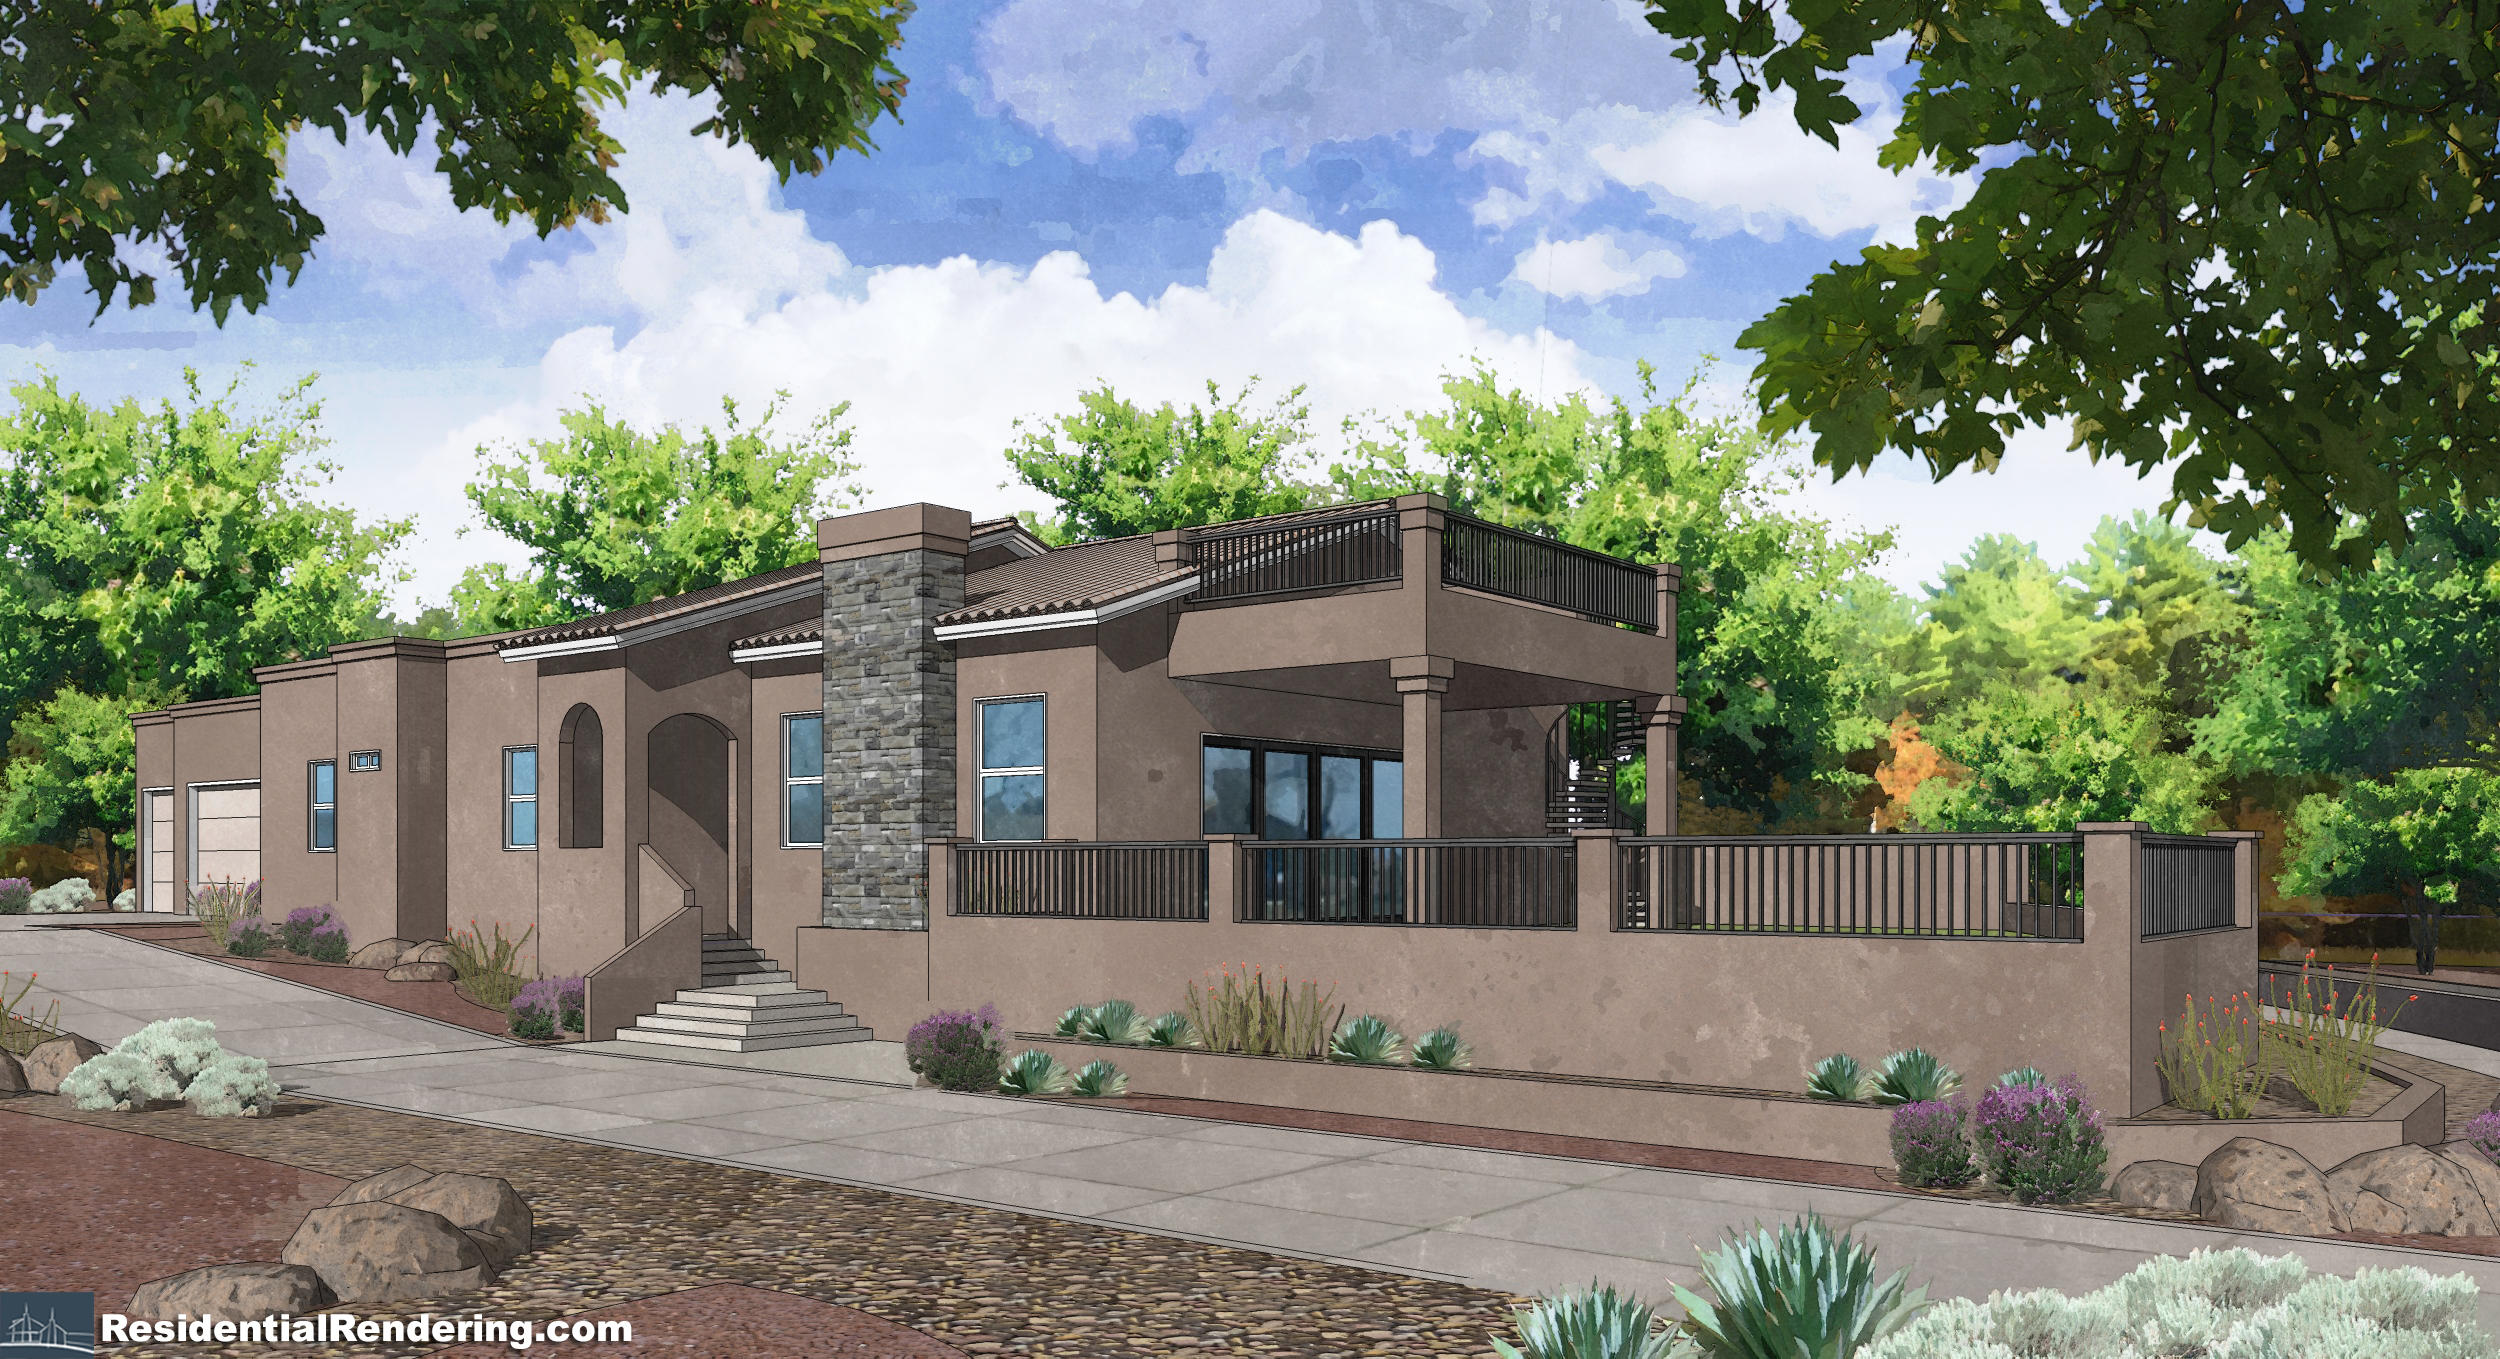 6055 REDONDO SIERRA VISTA NE Property Photo - Rio Rancho, NM real estate listing